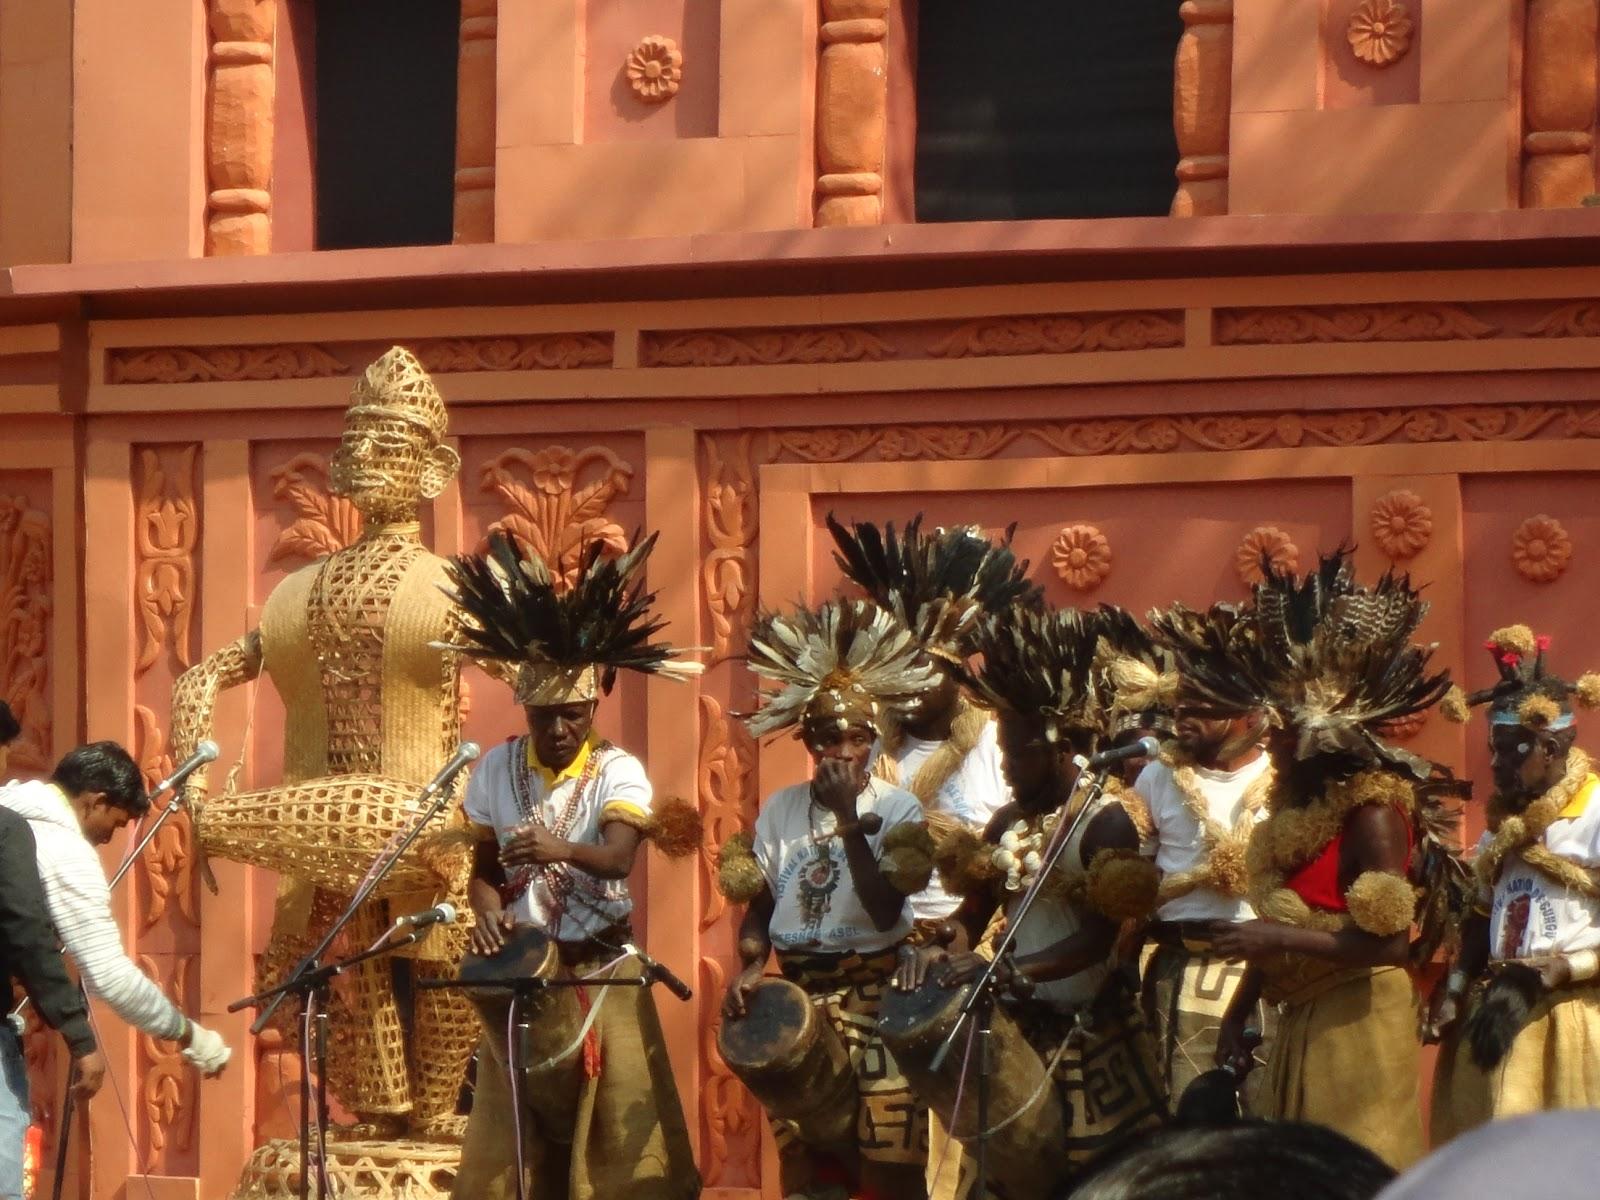 Congo Troupe performing at the Surajkund arts mela, India